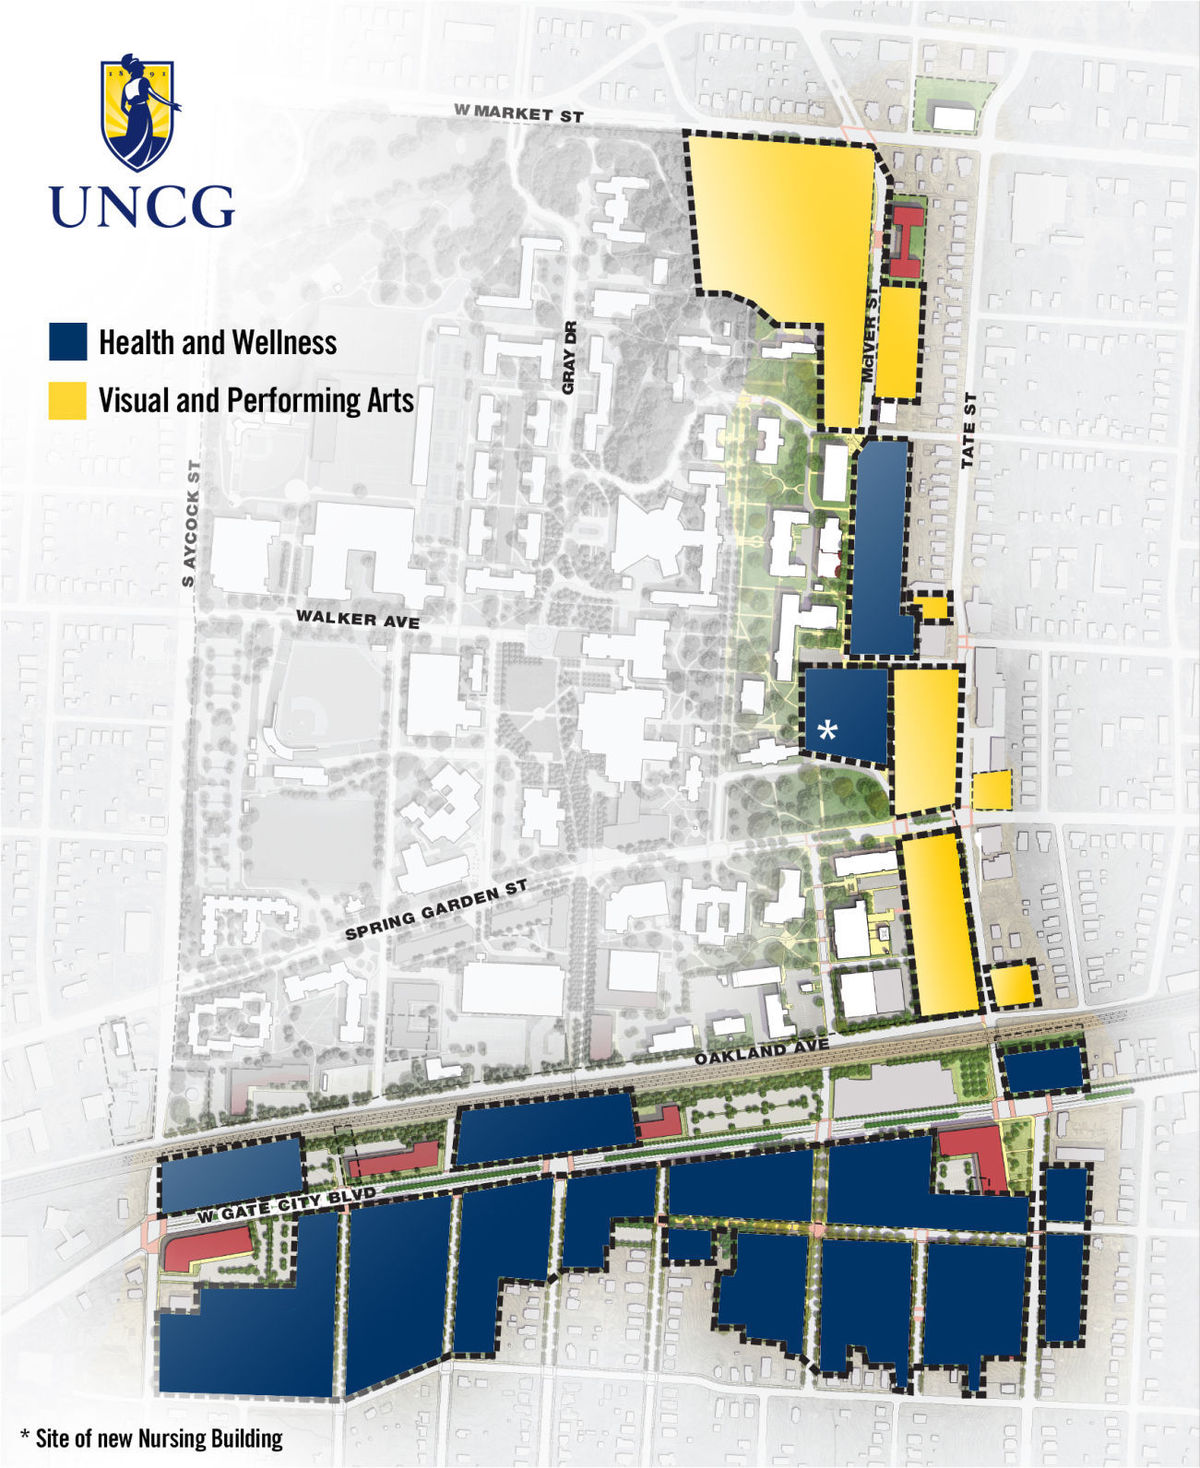 UNCG Alumni Association - News